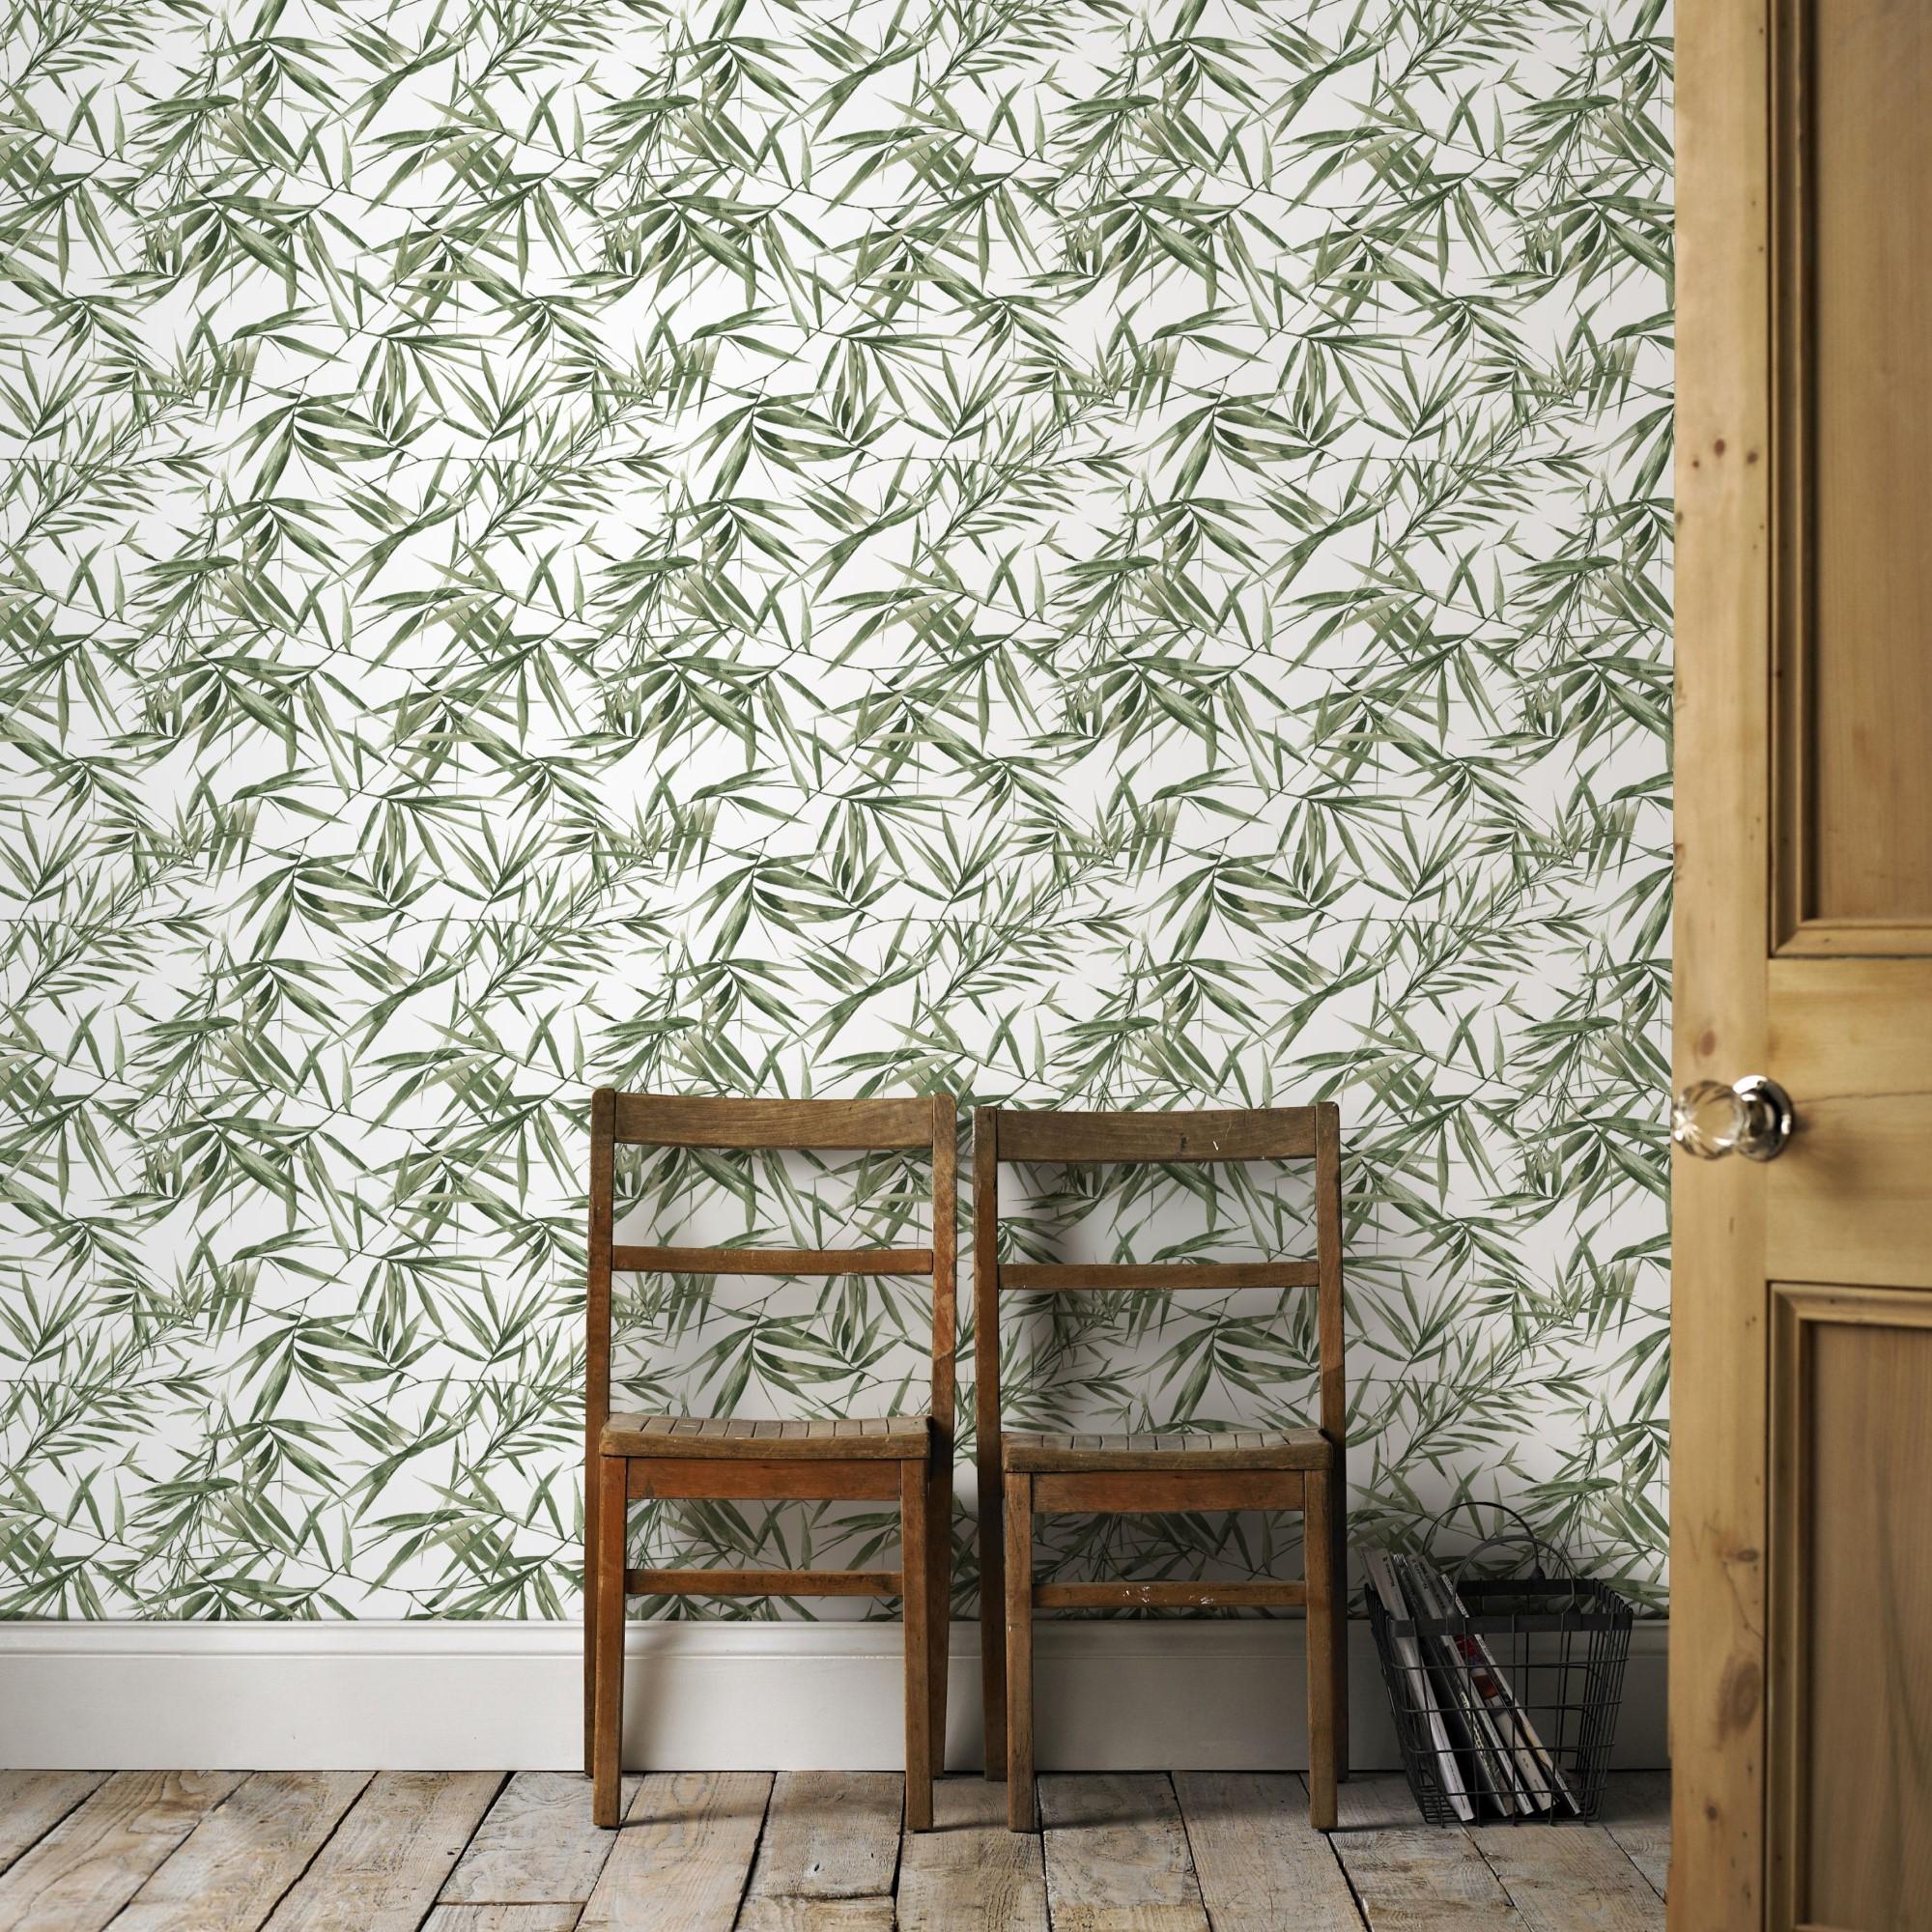 Papier peint intissé feuilles de bambou vert blanc 1005x52cm